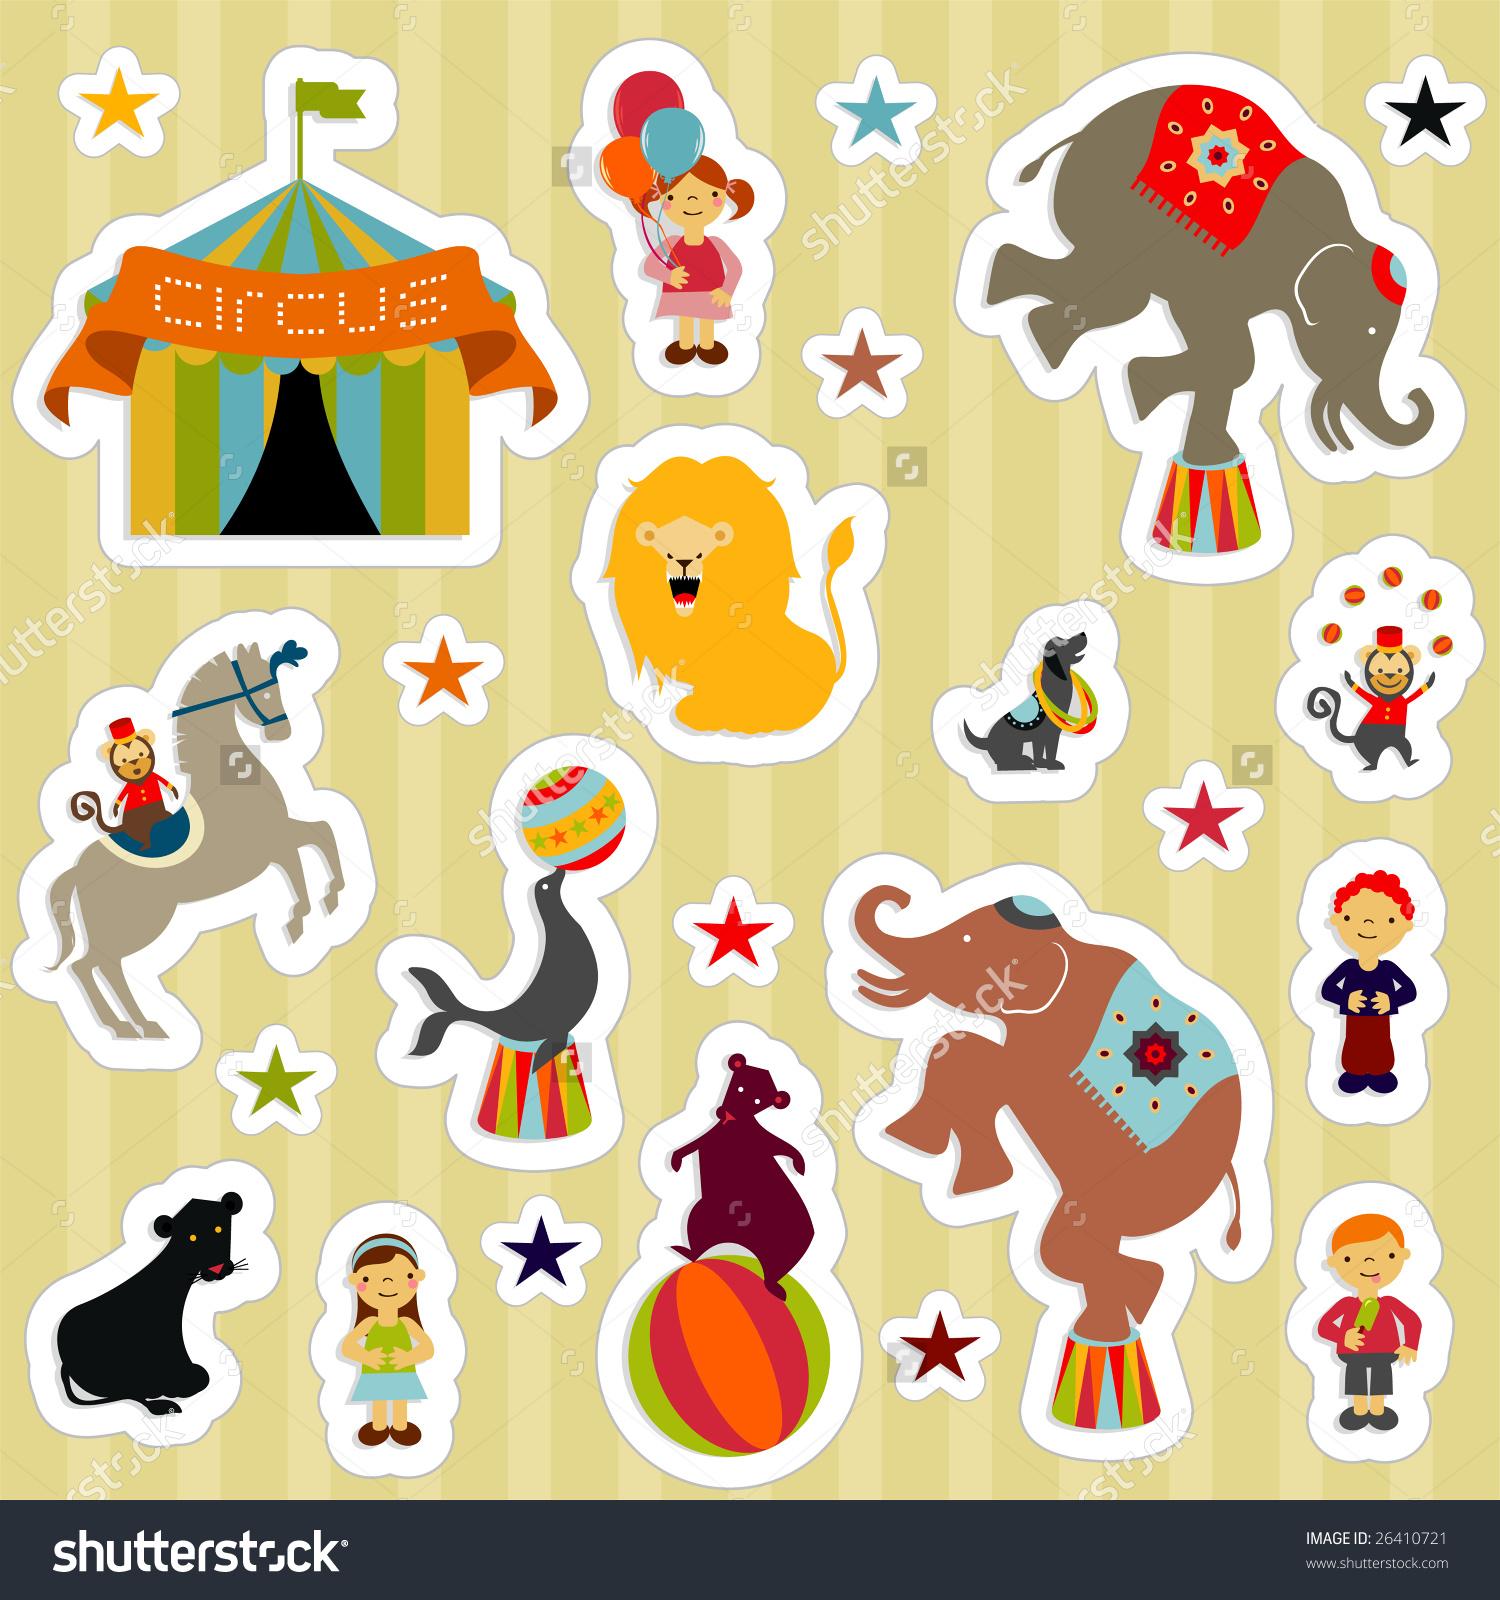 Circus Elements Like Elephants, Horse, Lion, Seal, Dog, Bear.